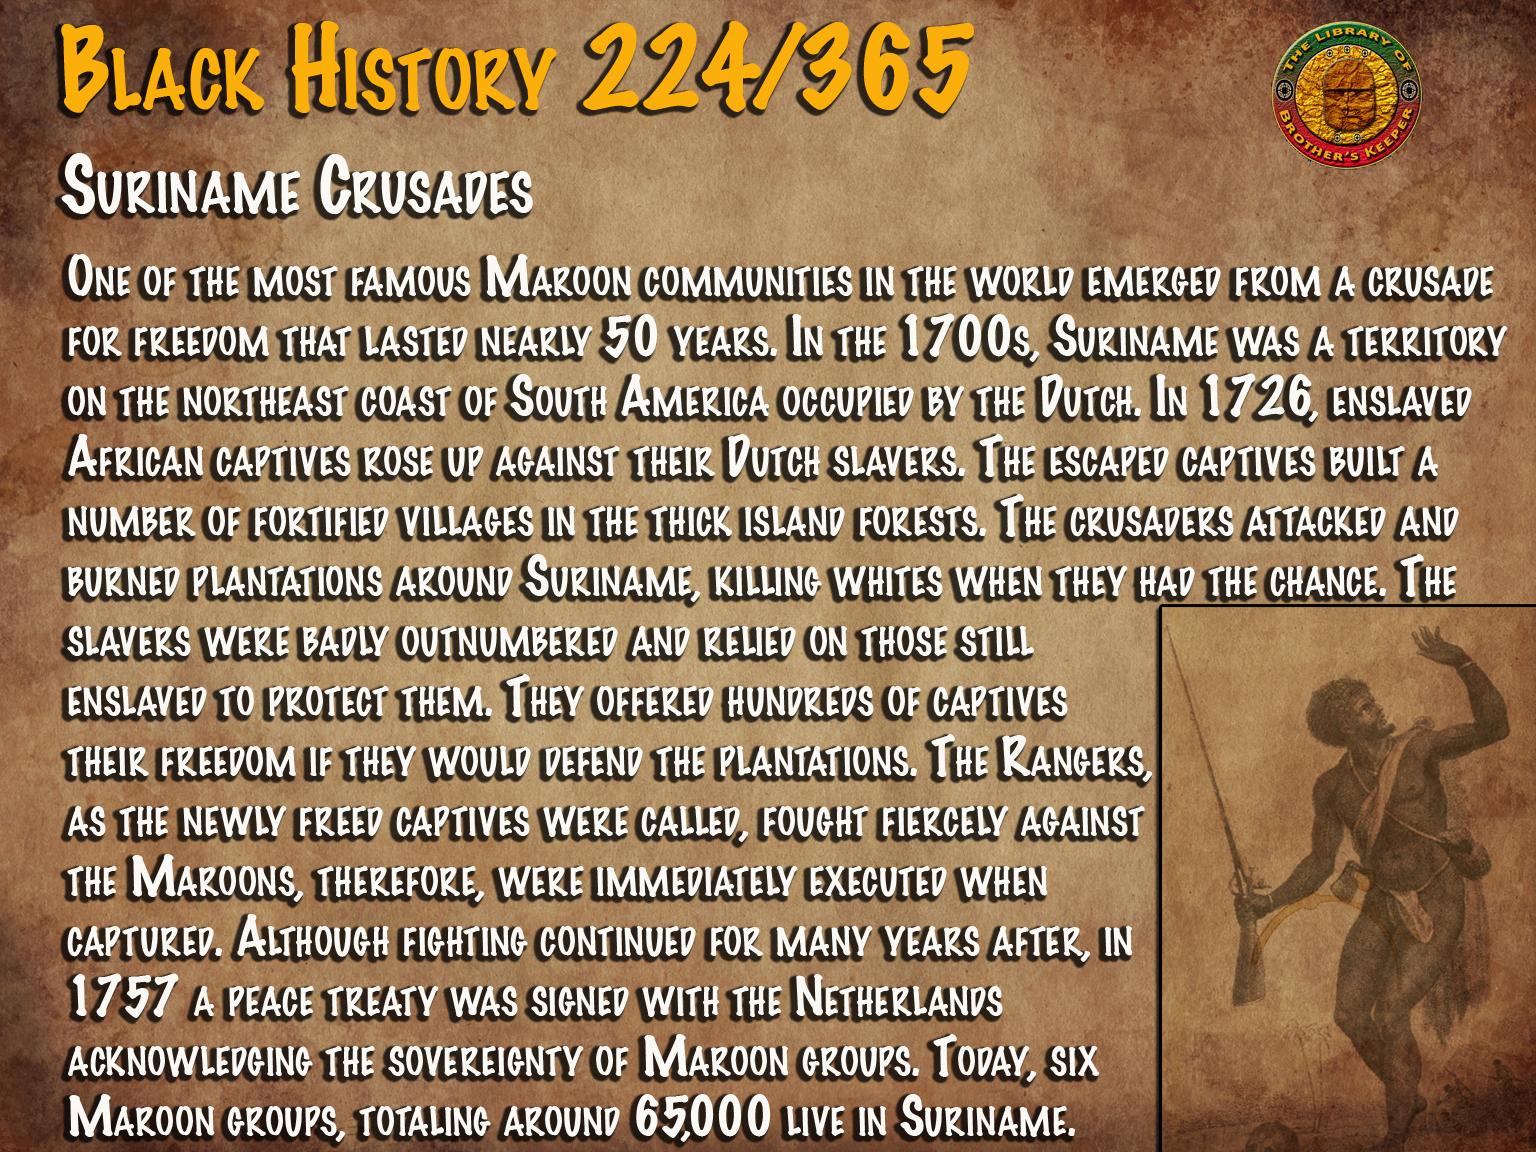 Suriname Crusades